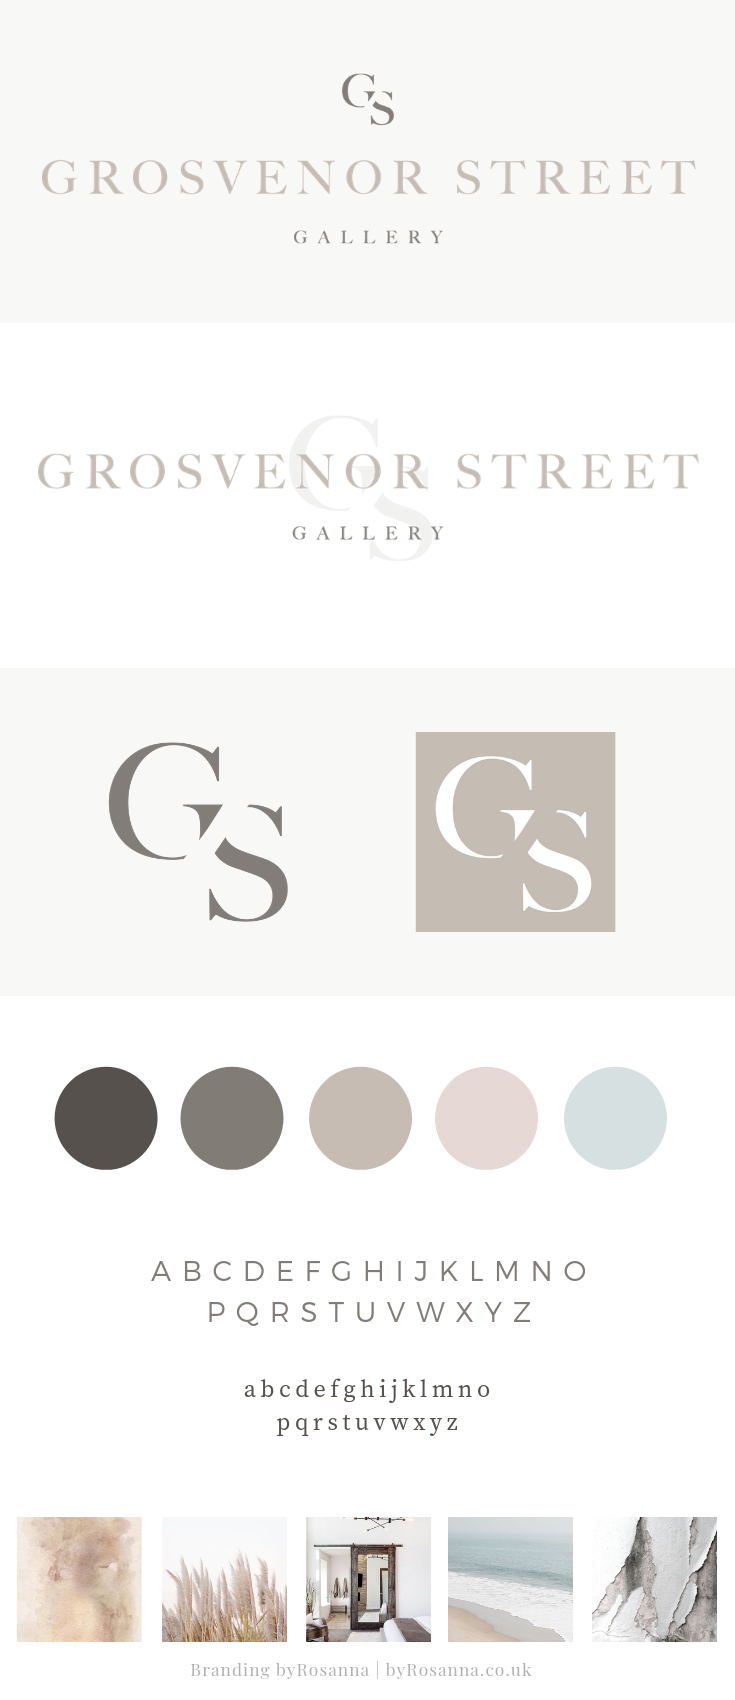 Art Gallery brand design